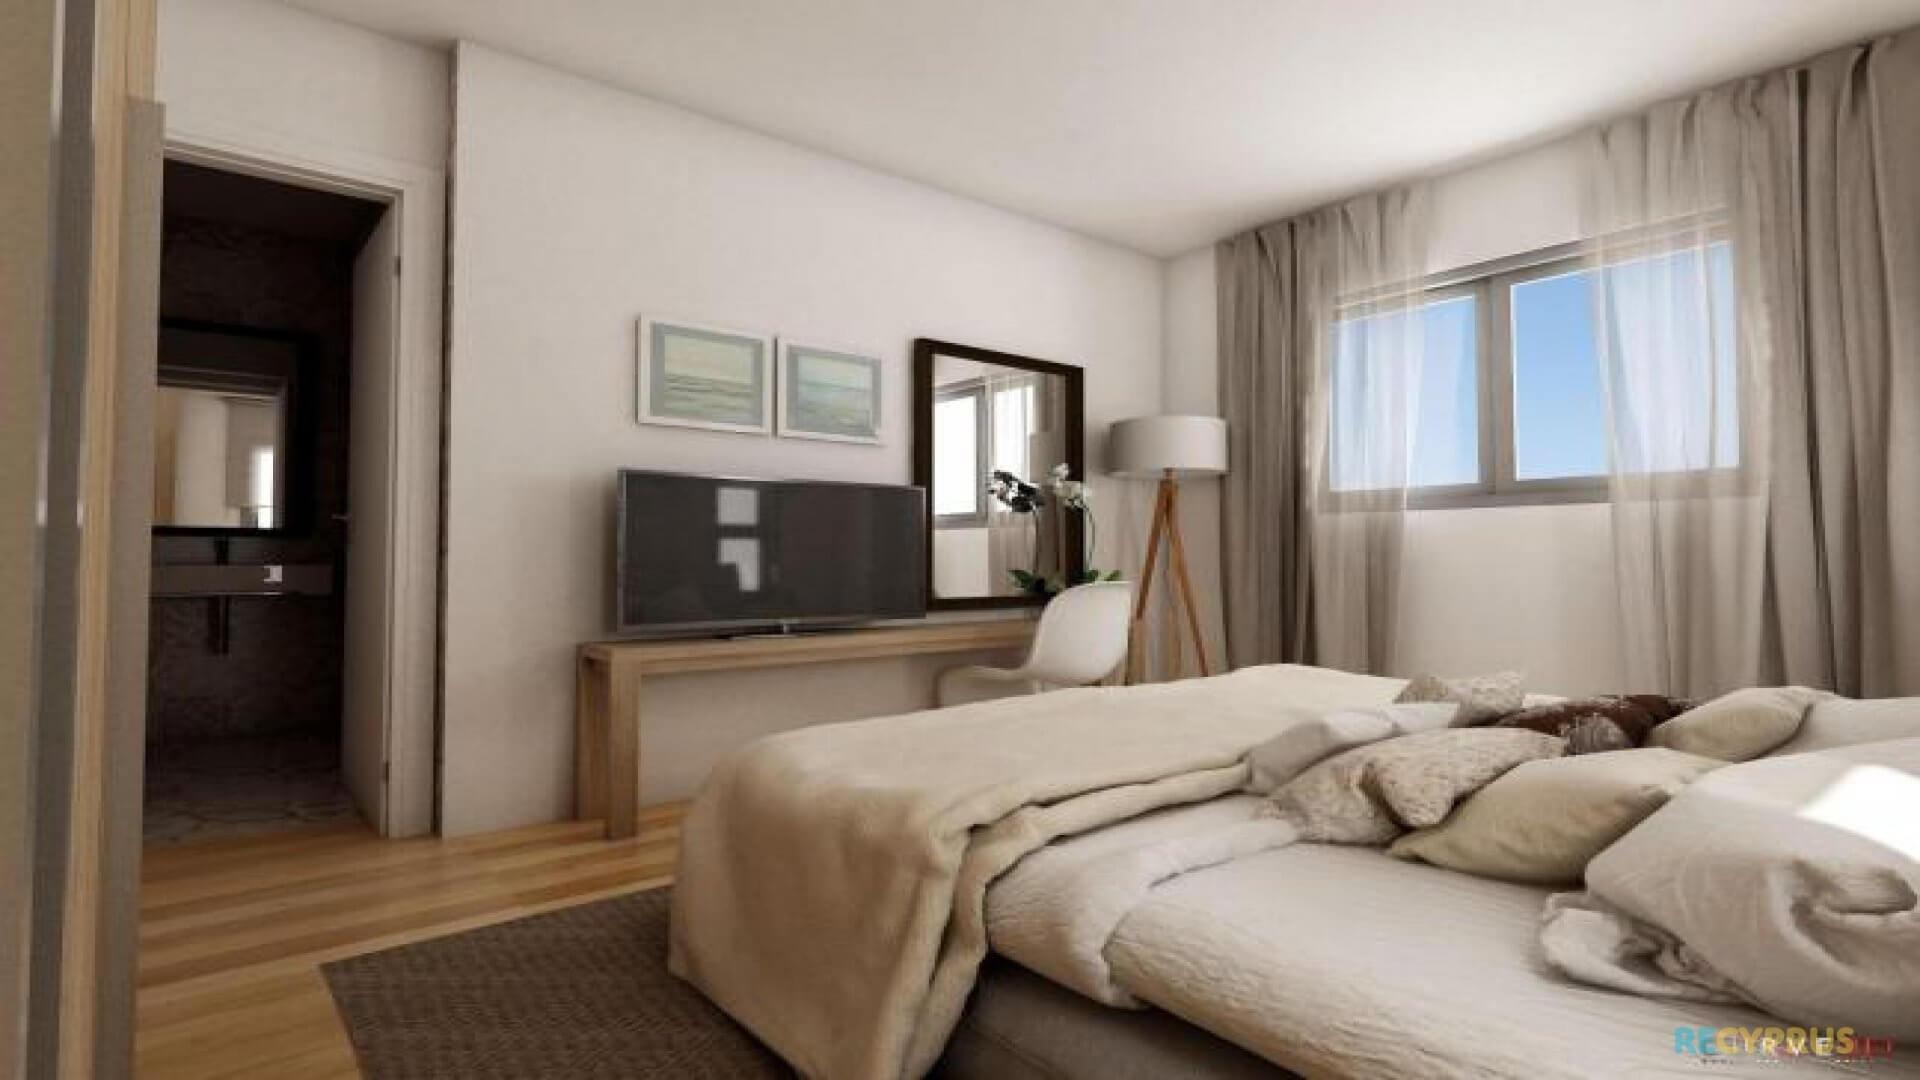 Apartment for sale City Center Larnaca Cyprus 7 3583